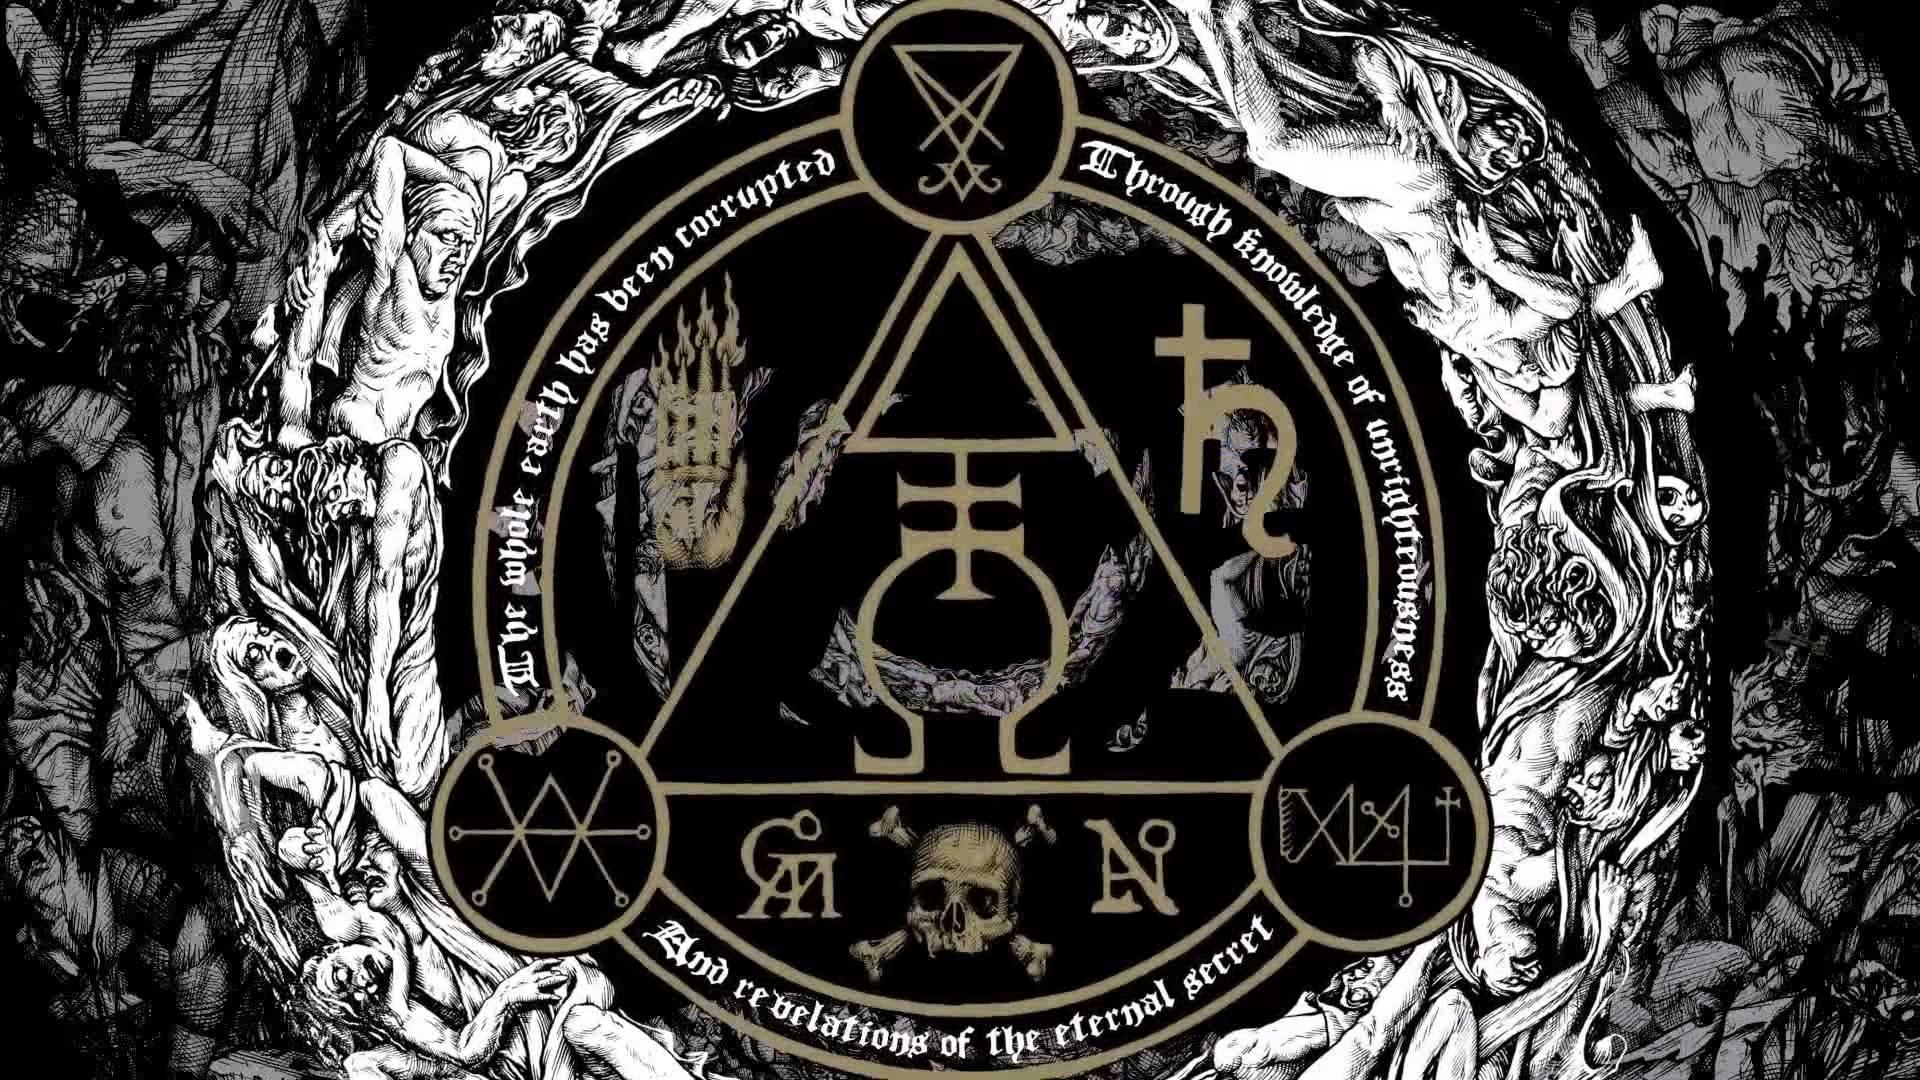 Black Sabbath - Download 2016